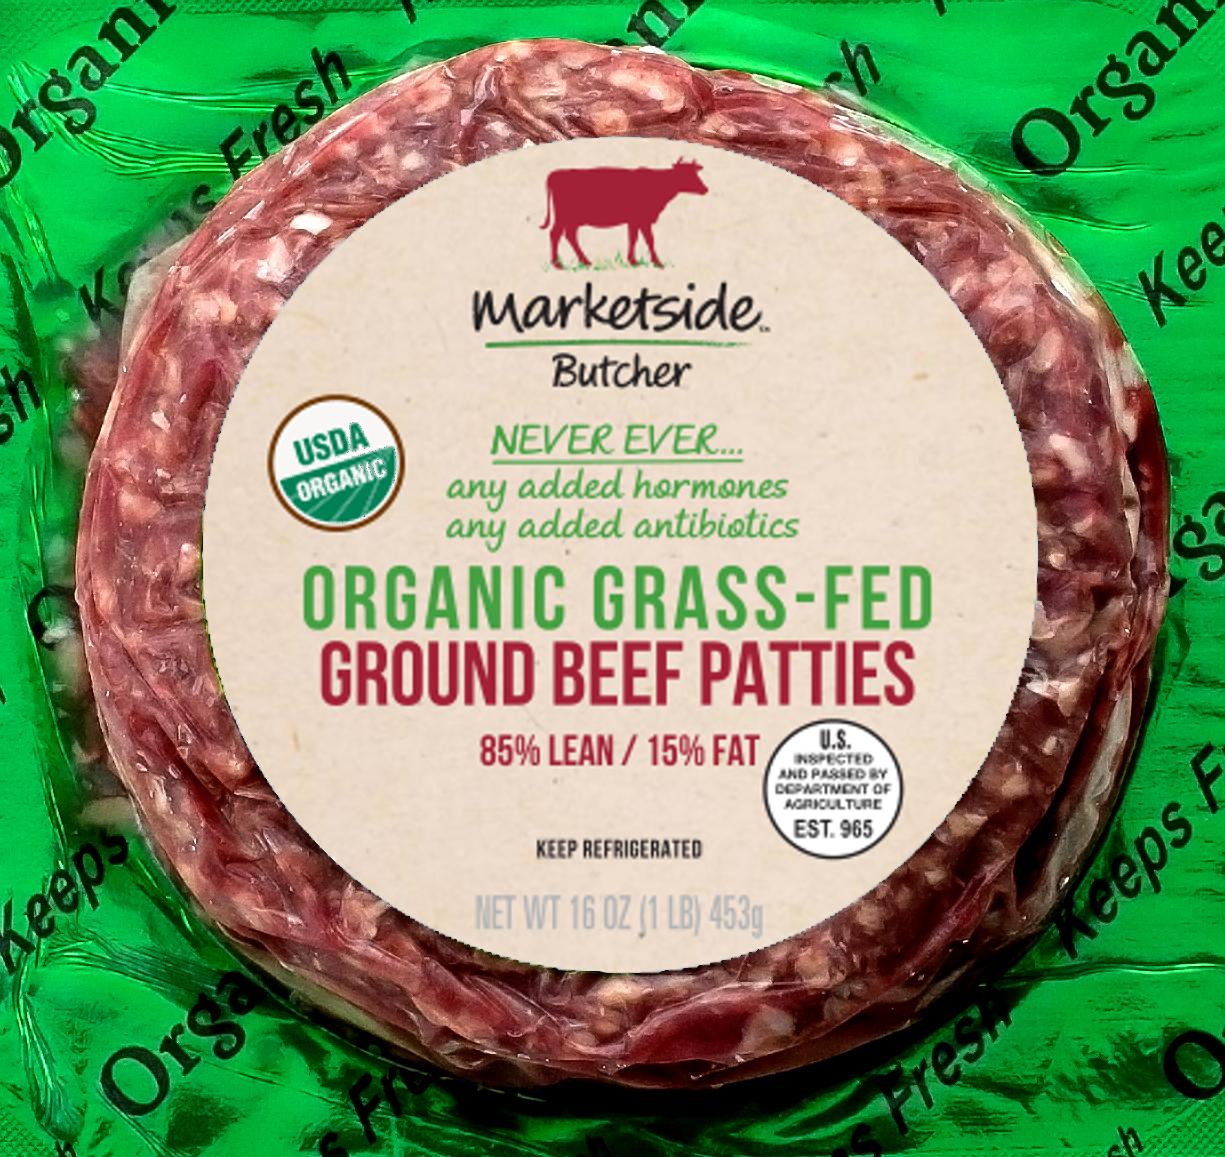 Marketside Organic Grass-Fed 85% Lean/15% Fat, Ground Beef Patties, 4ct, 1 lb